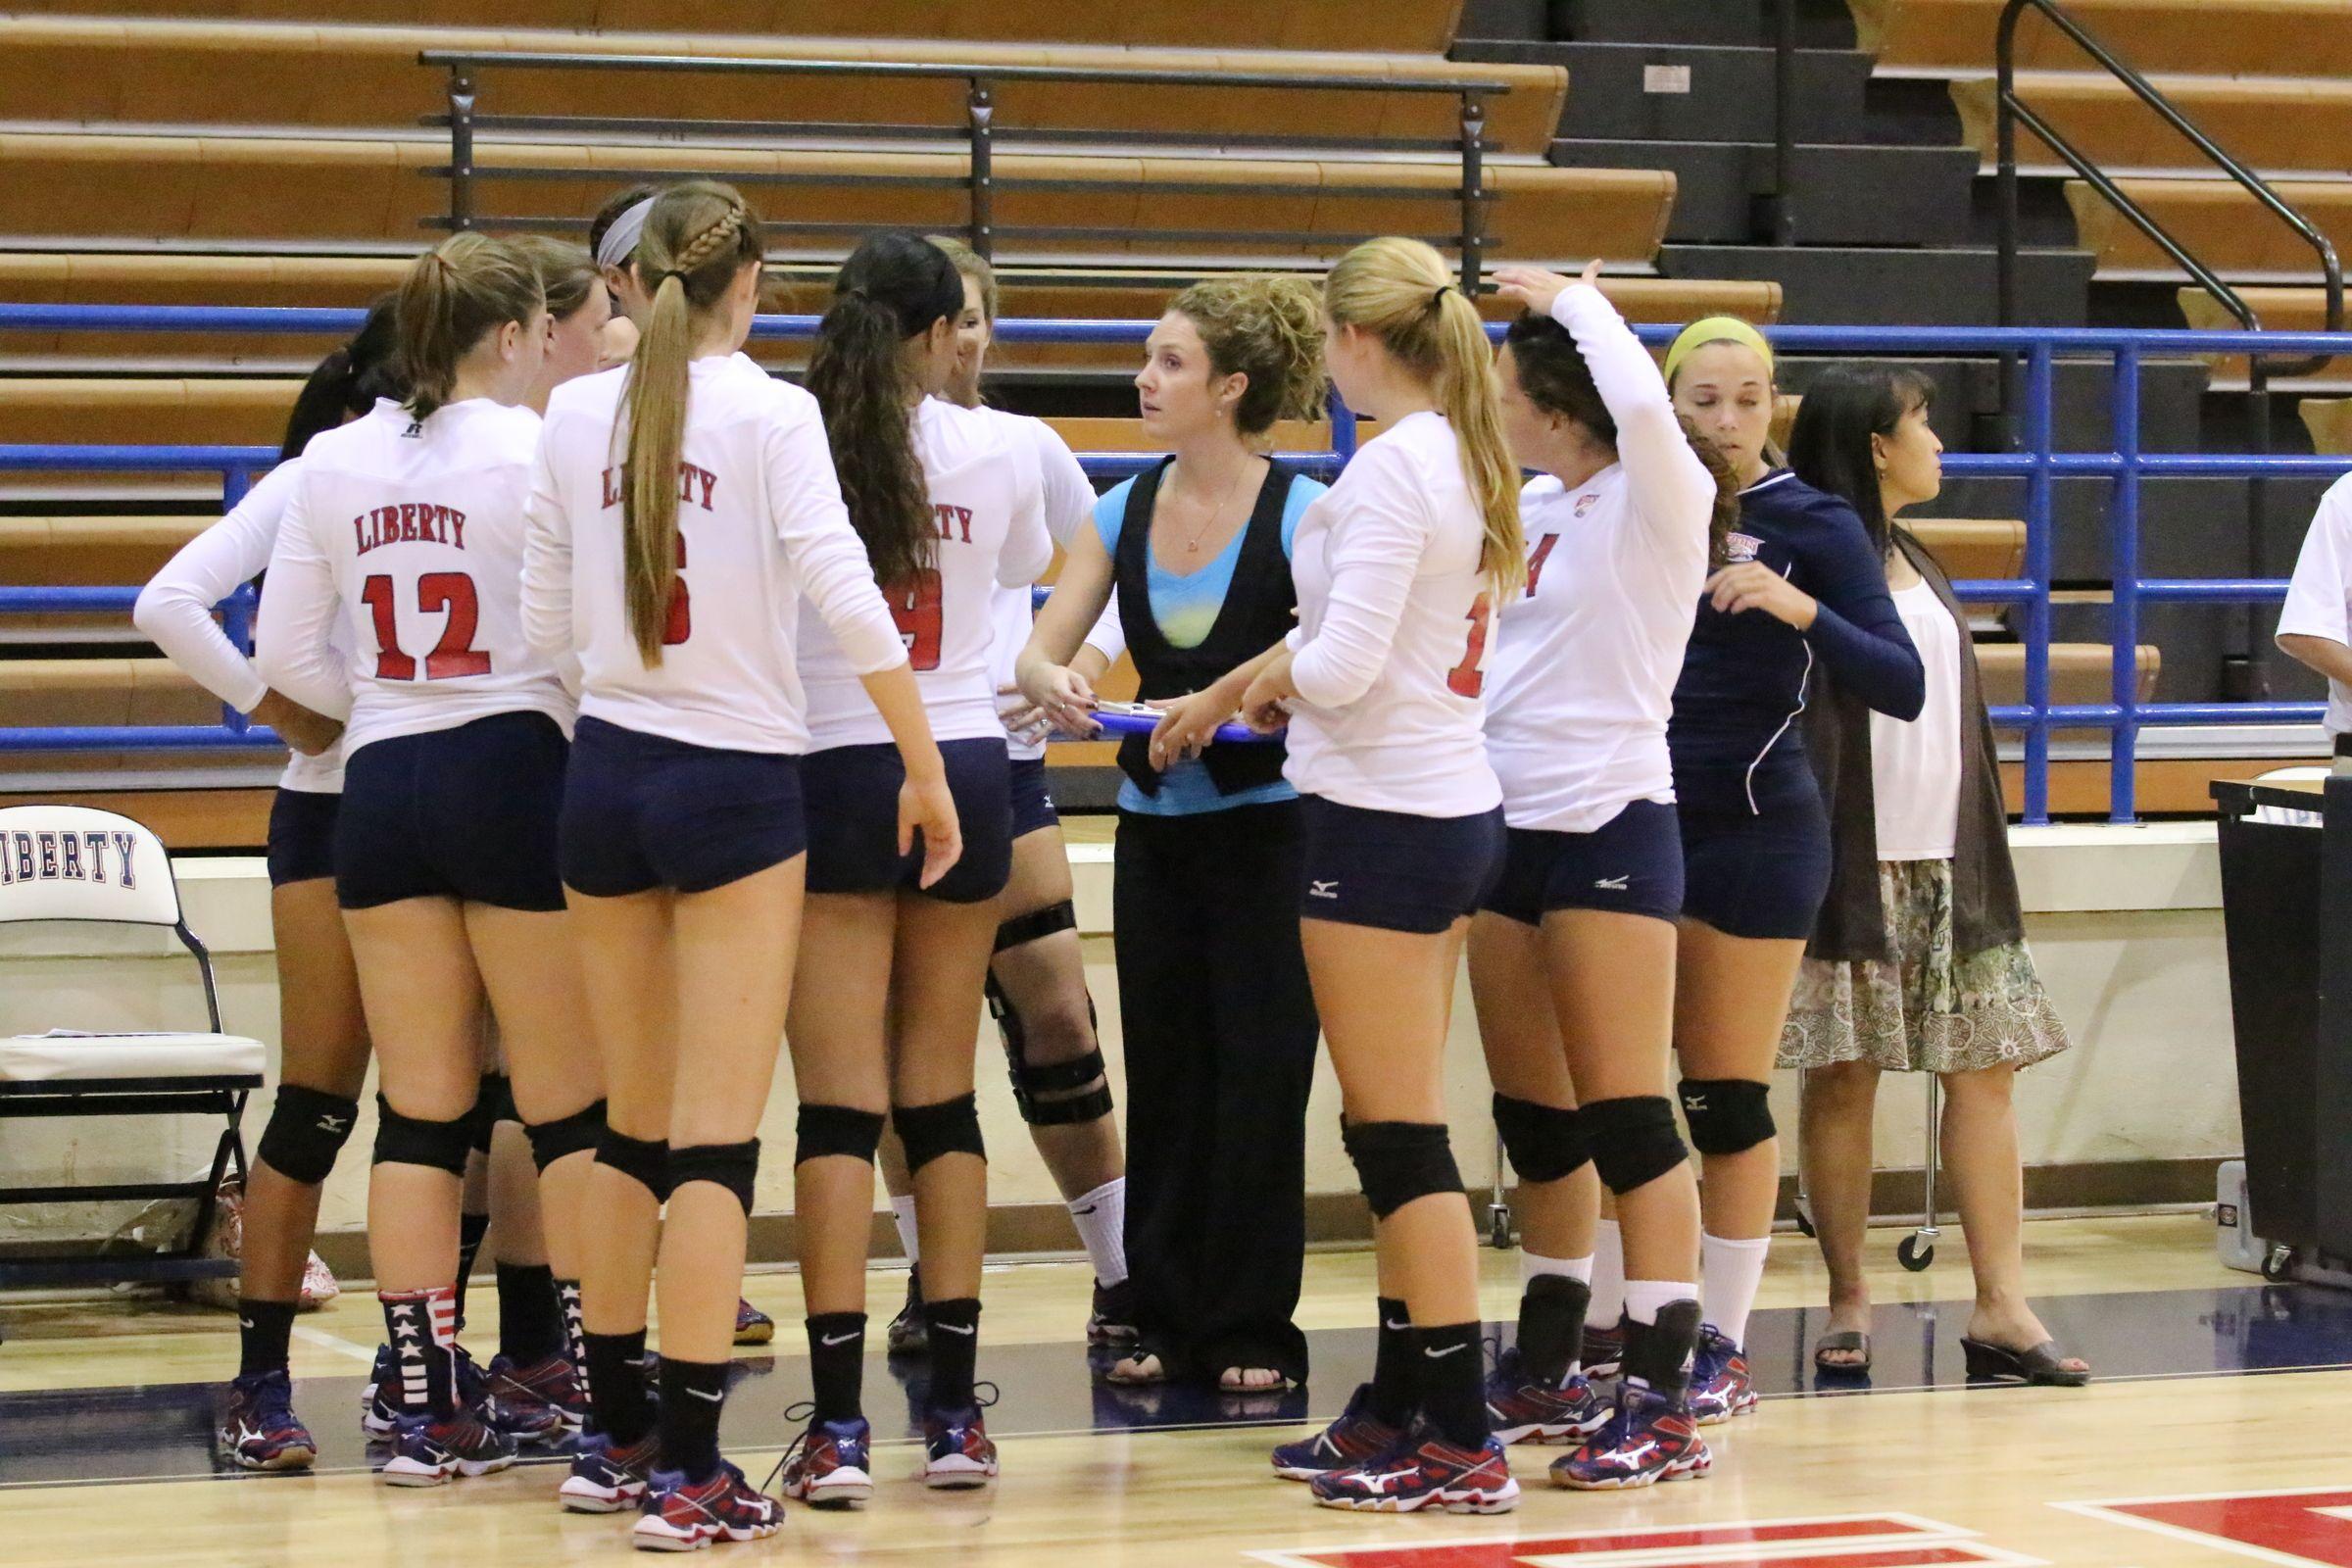 2015 Lhs Volleyball Liberty High School Volleyball Cheer Skirts